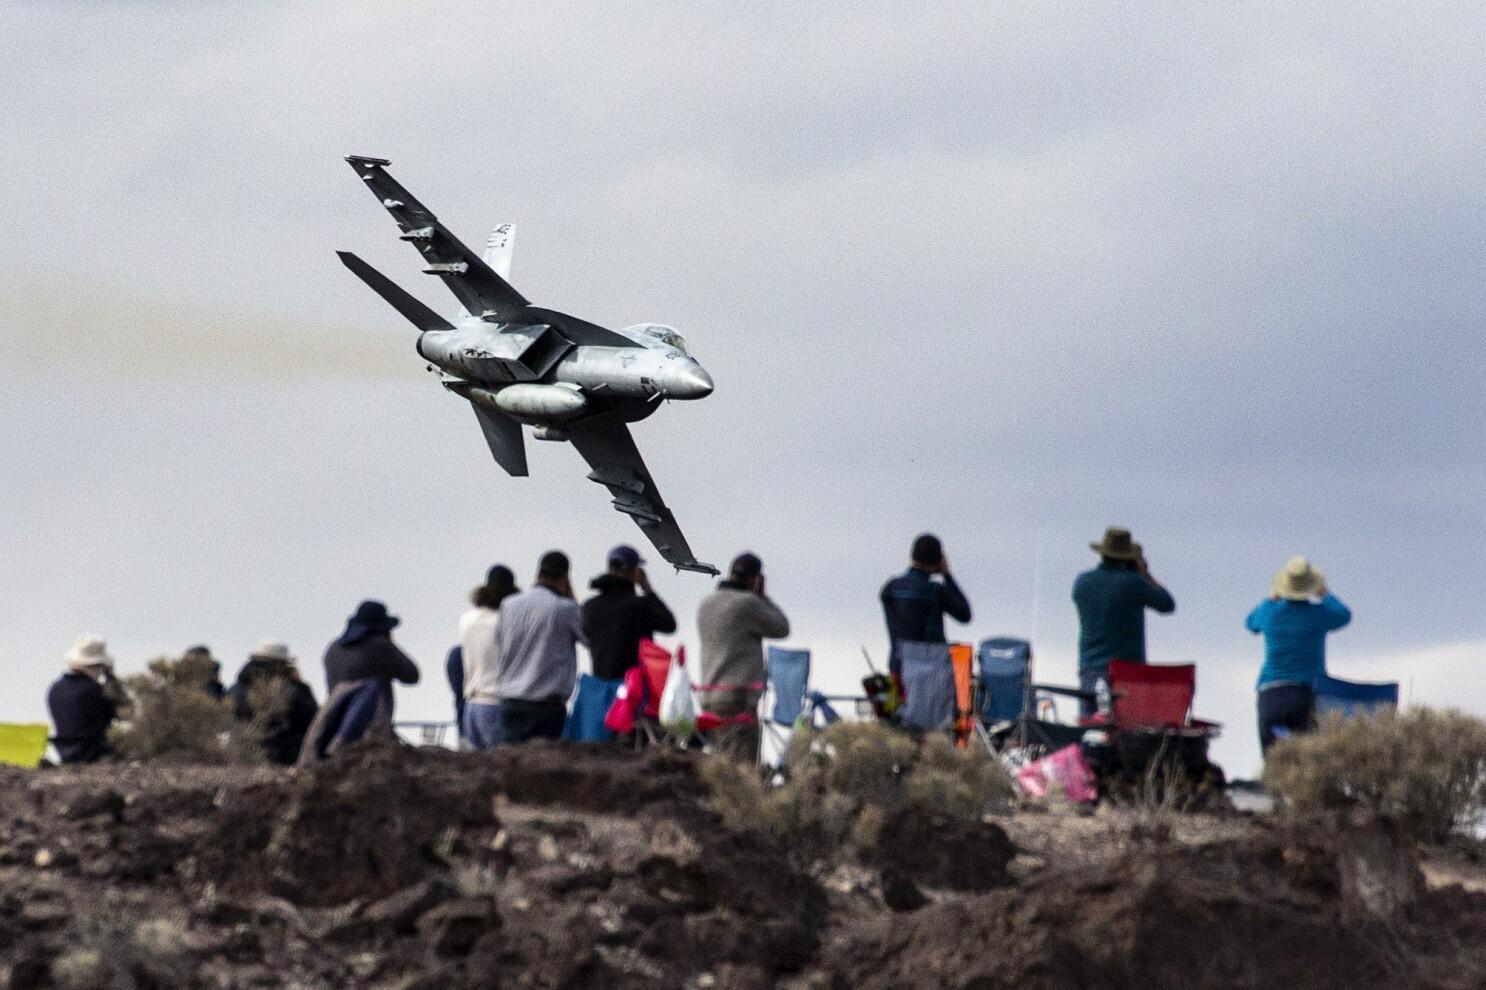 In Death Valley S Star Wars Canyon Fighter Jet Aficionados Have